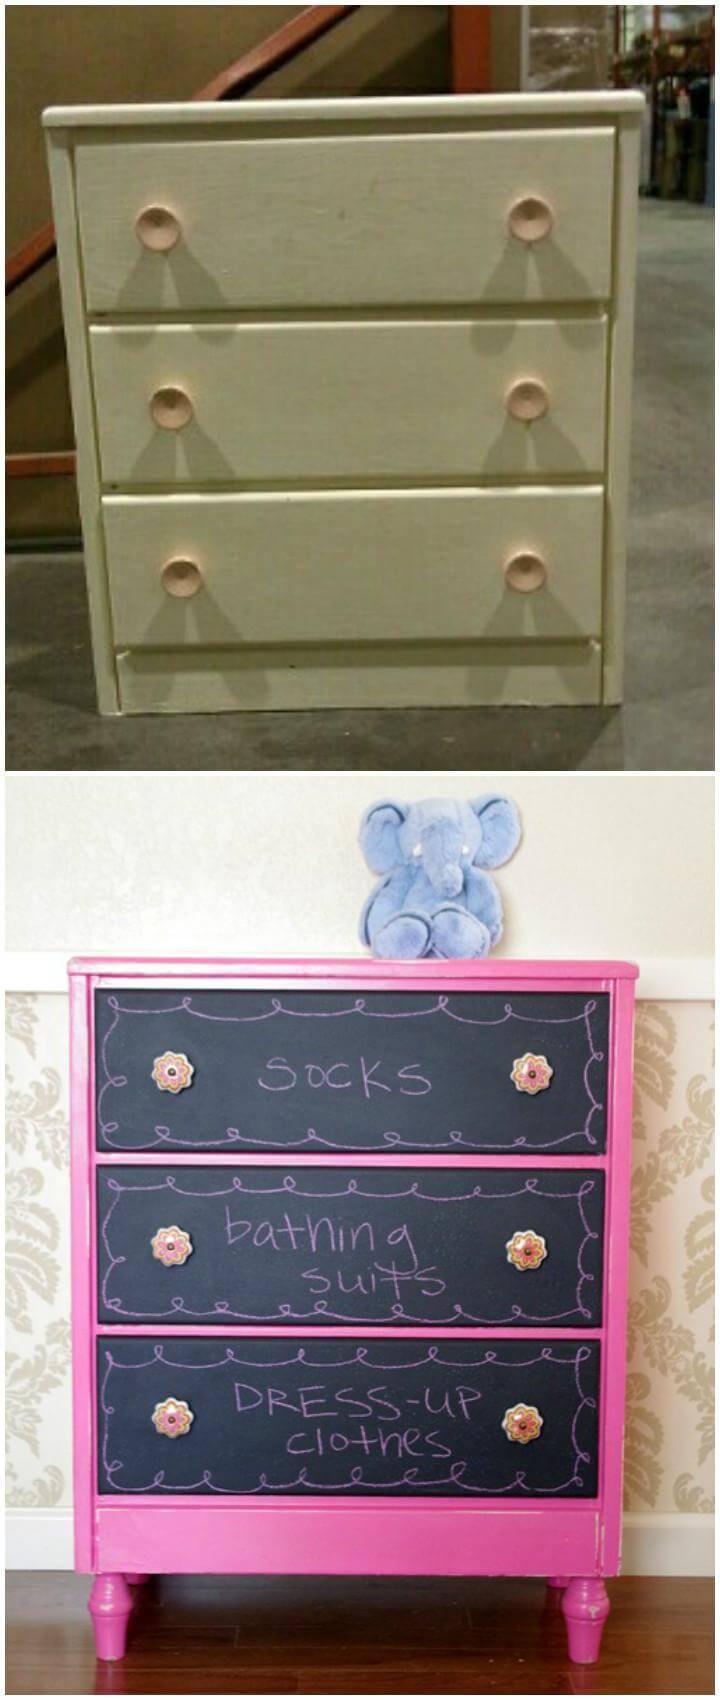 DIY Chalkpainted Dresser - Smart Furniture Transformation